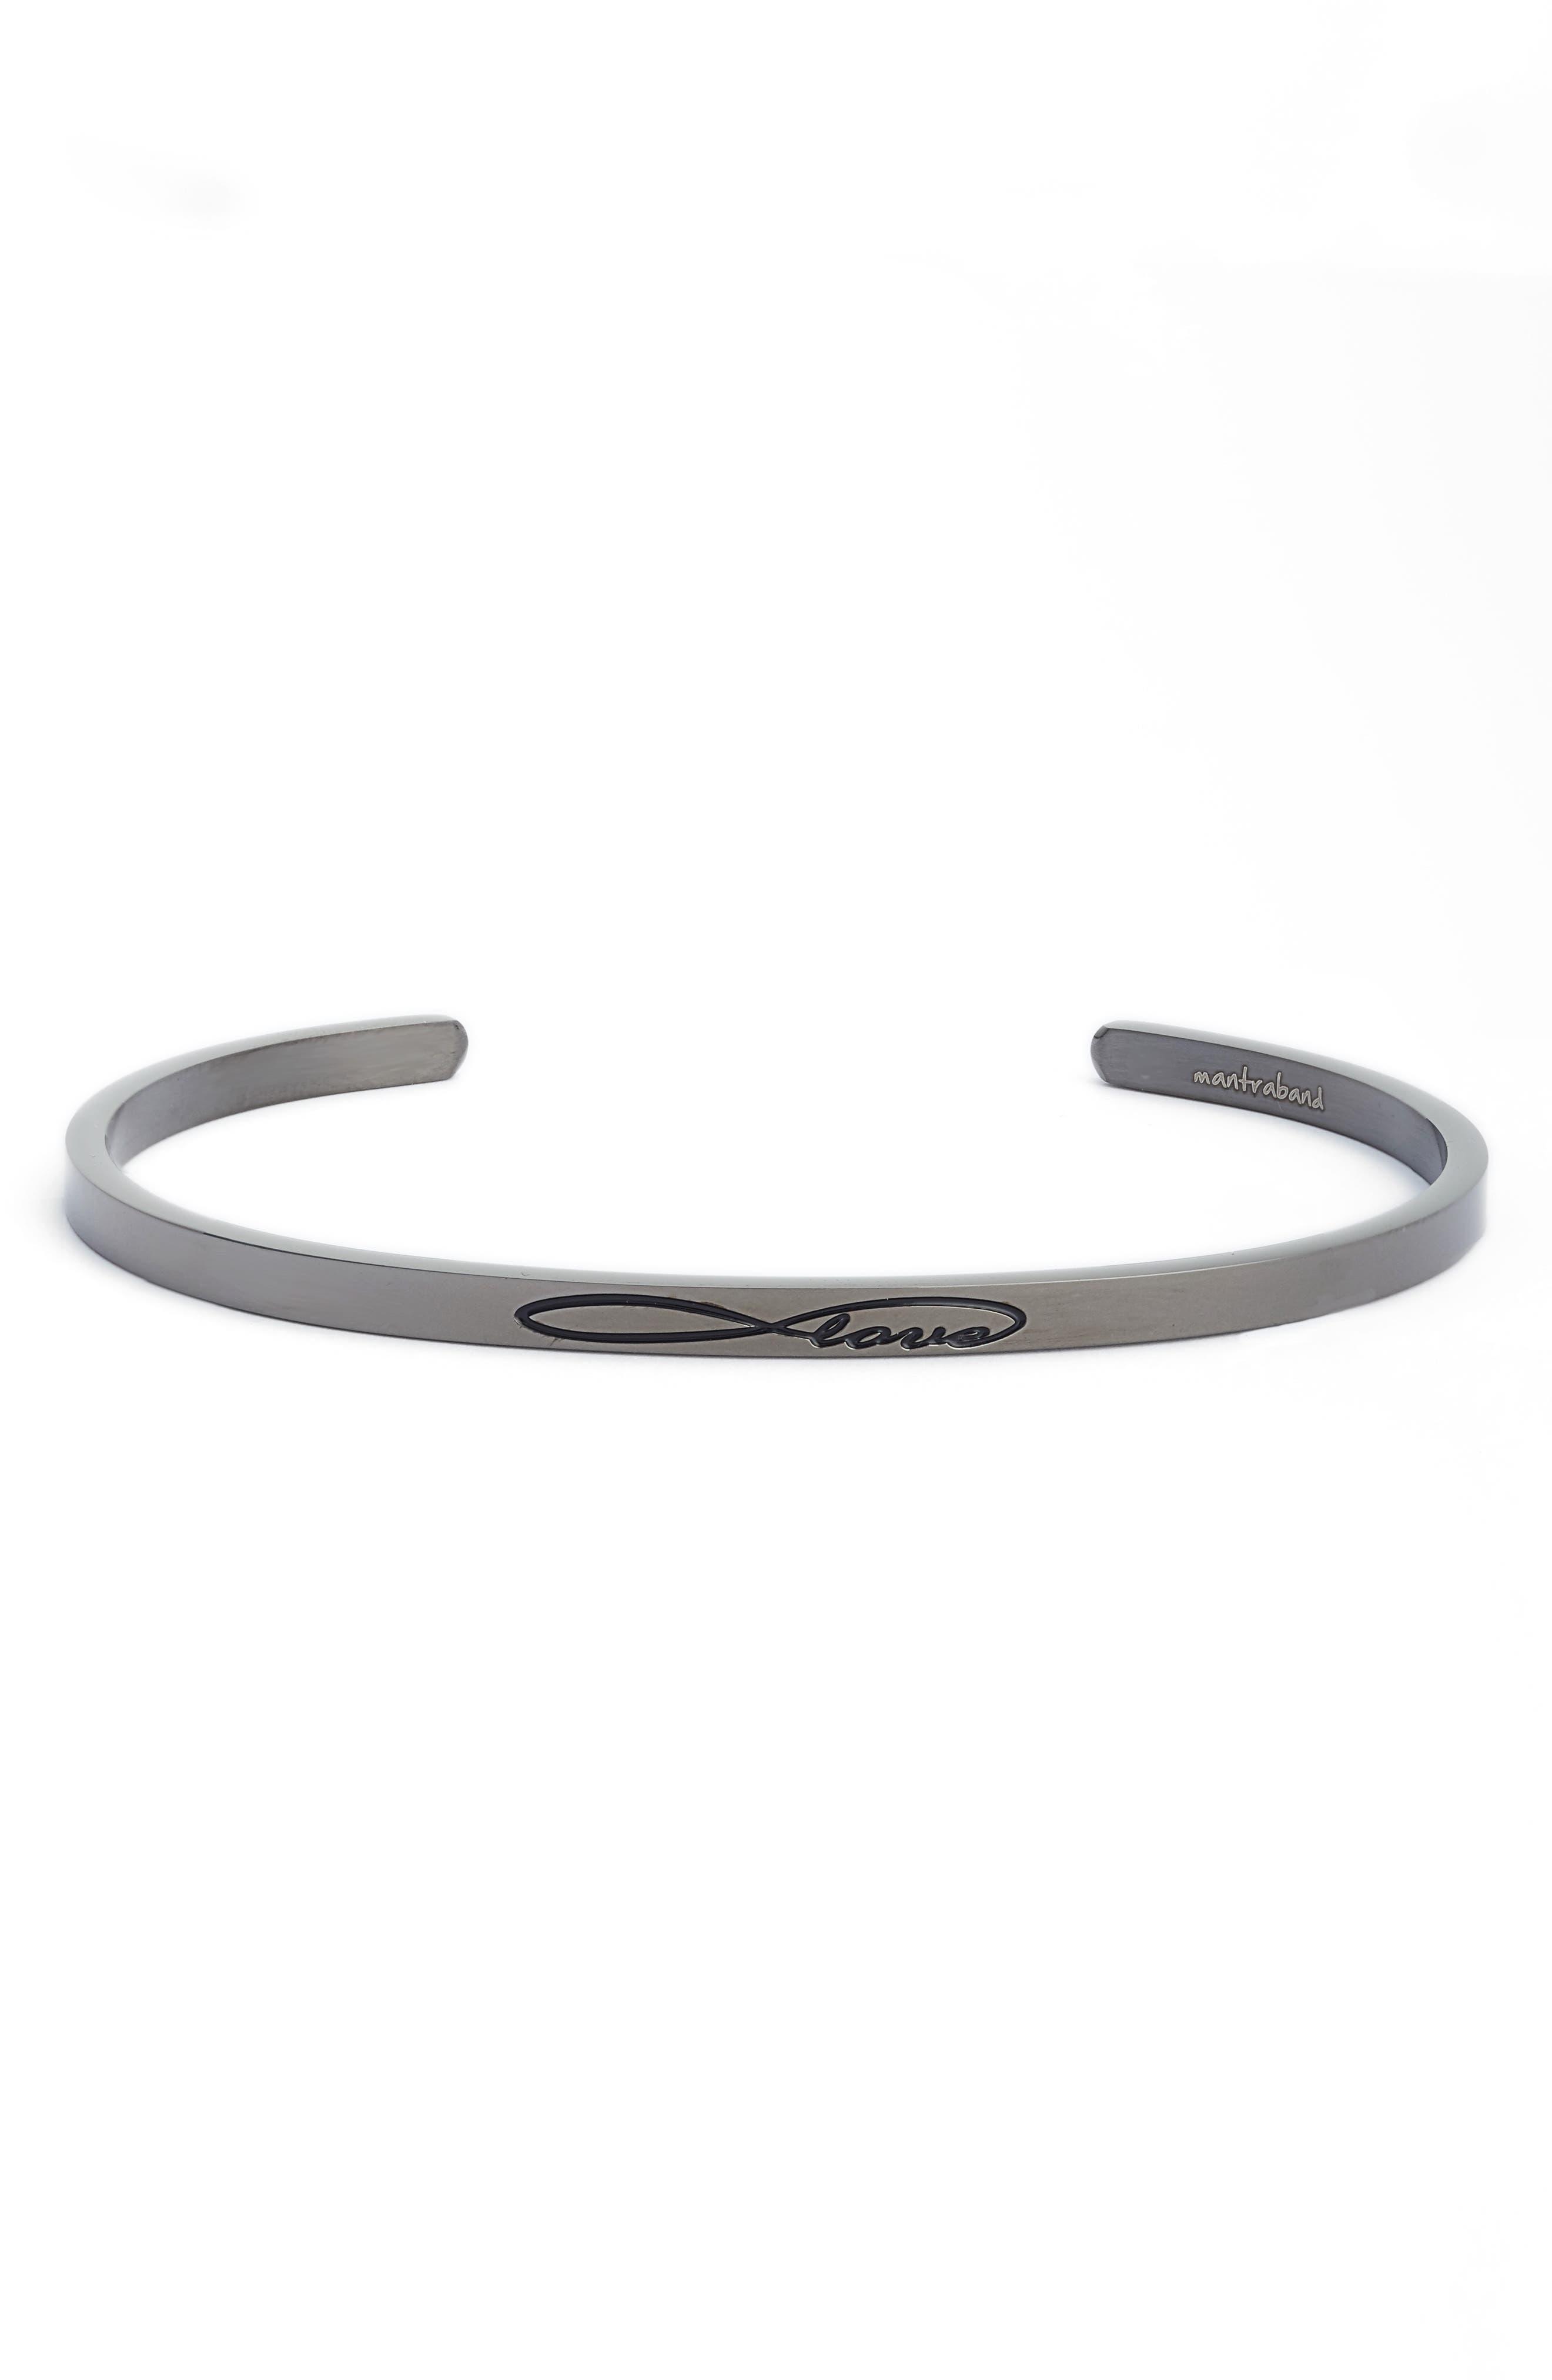 Infinite Love Cuff Bracelet,                             Main thumbnail 1, color,                             Moon Gray